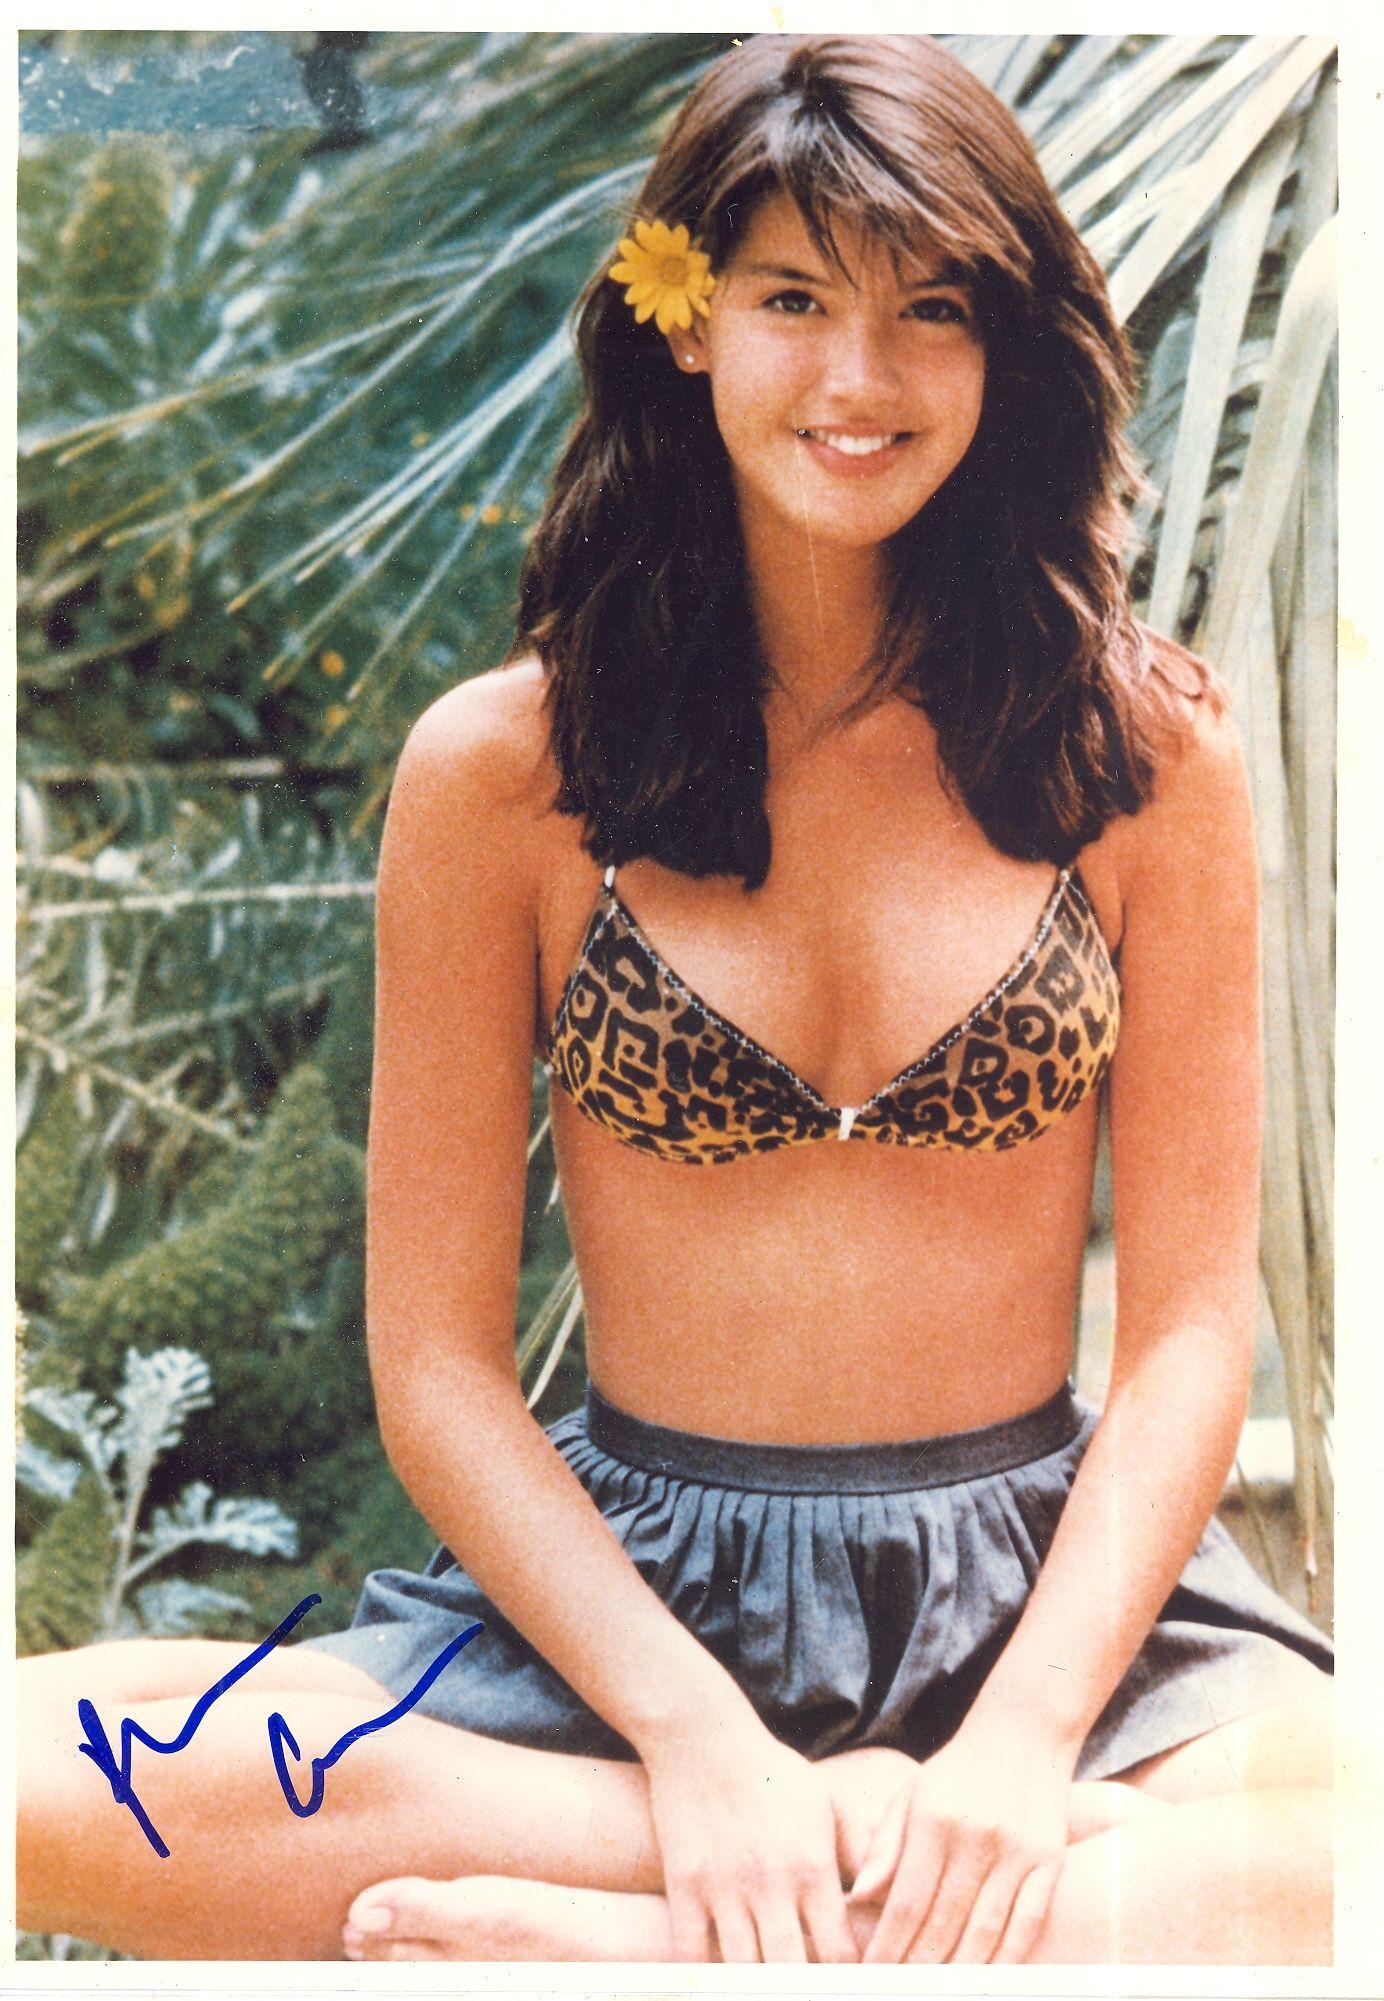 phoebe cates - paradise 1982 (full song)